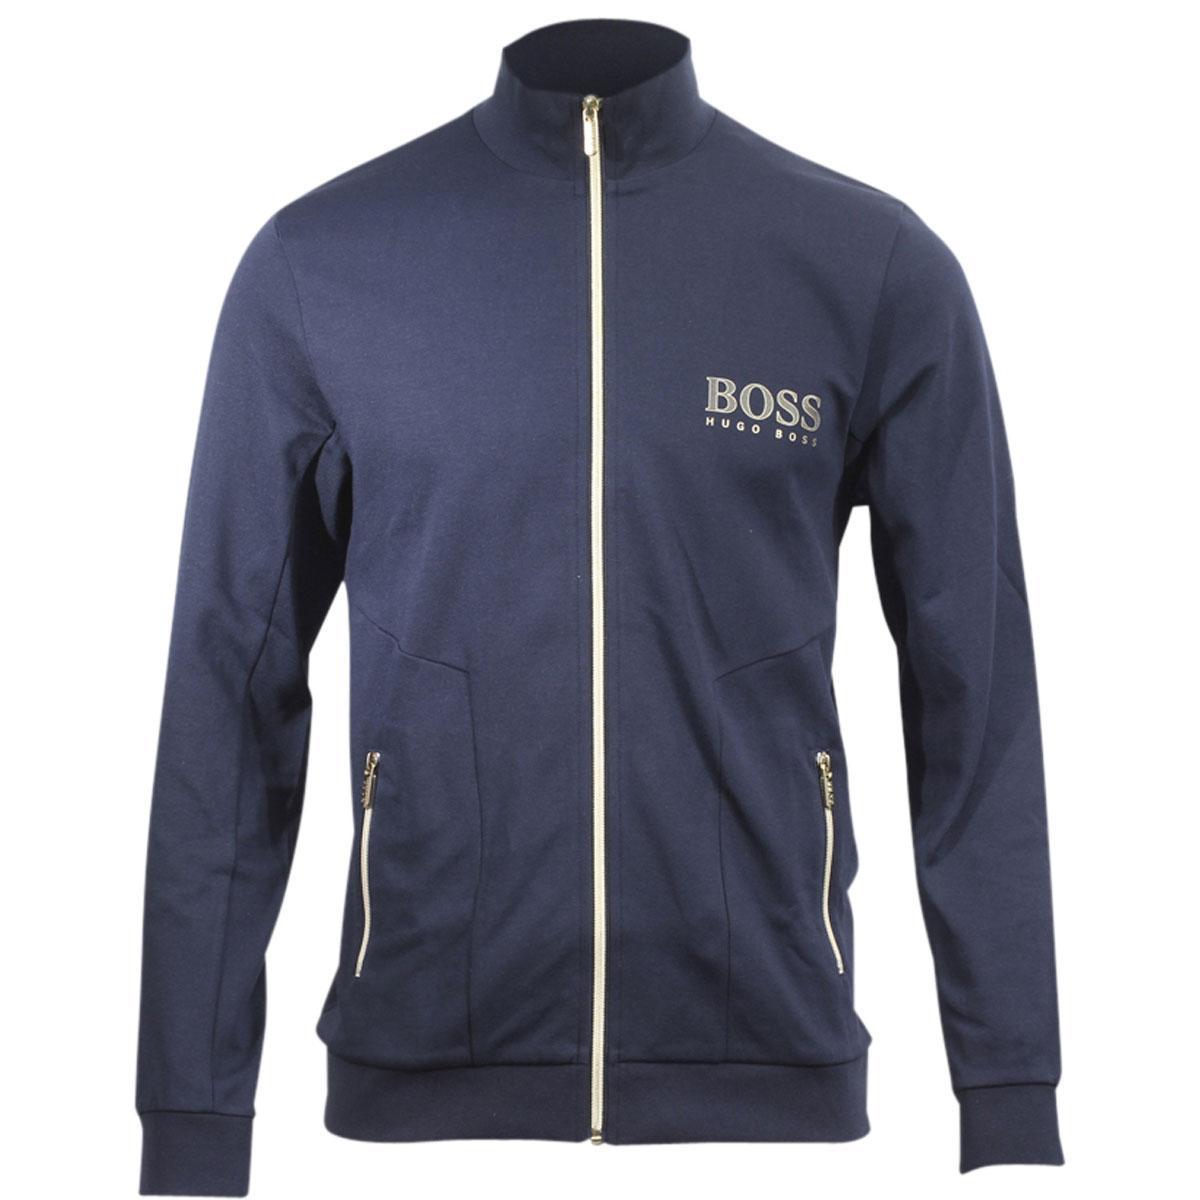 4837c9af Hugo Boss Men's Stretch Jersey Long Sleeve Tracksuit Jacket by Hugo Boss